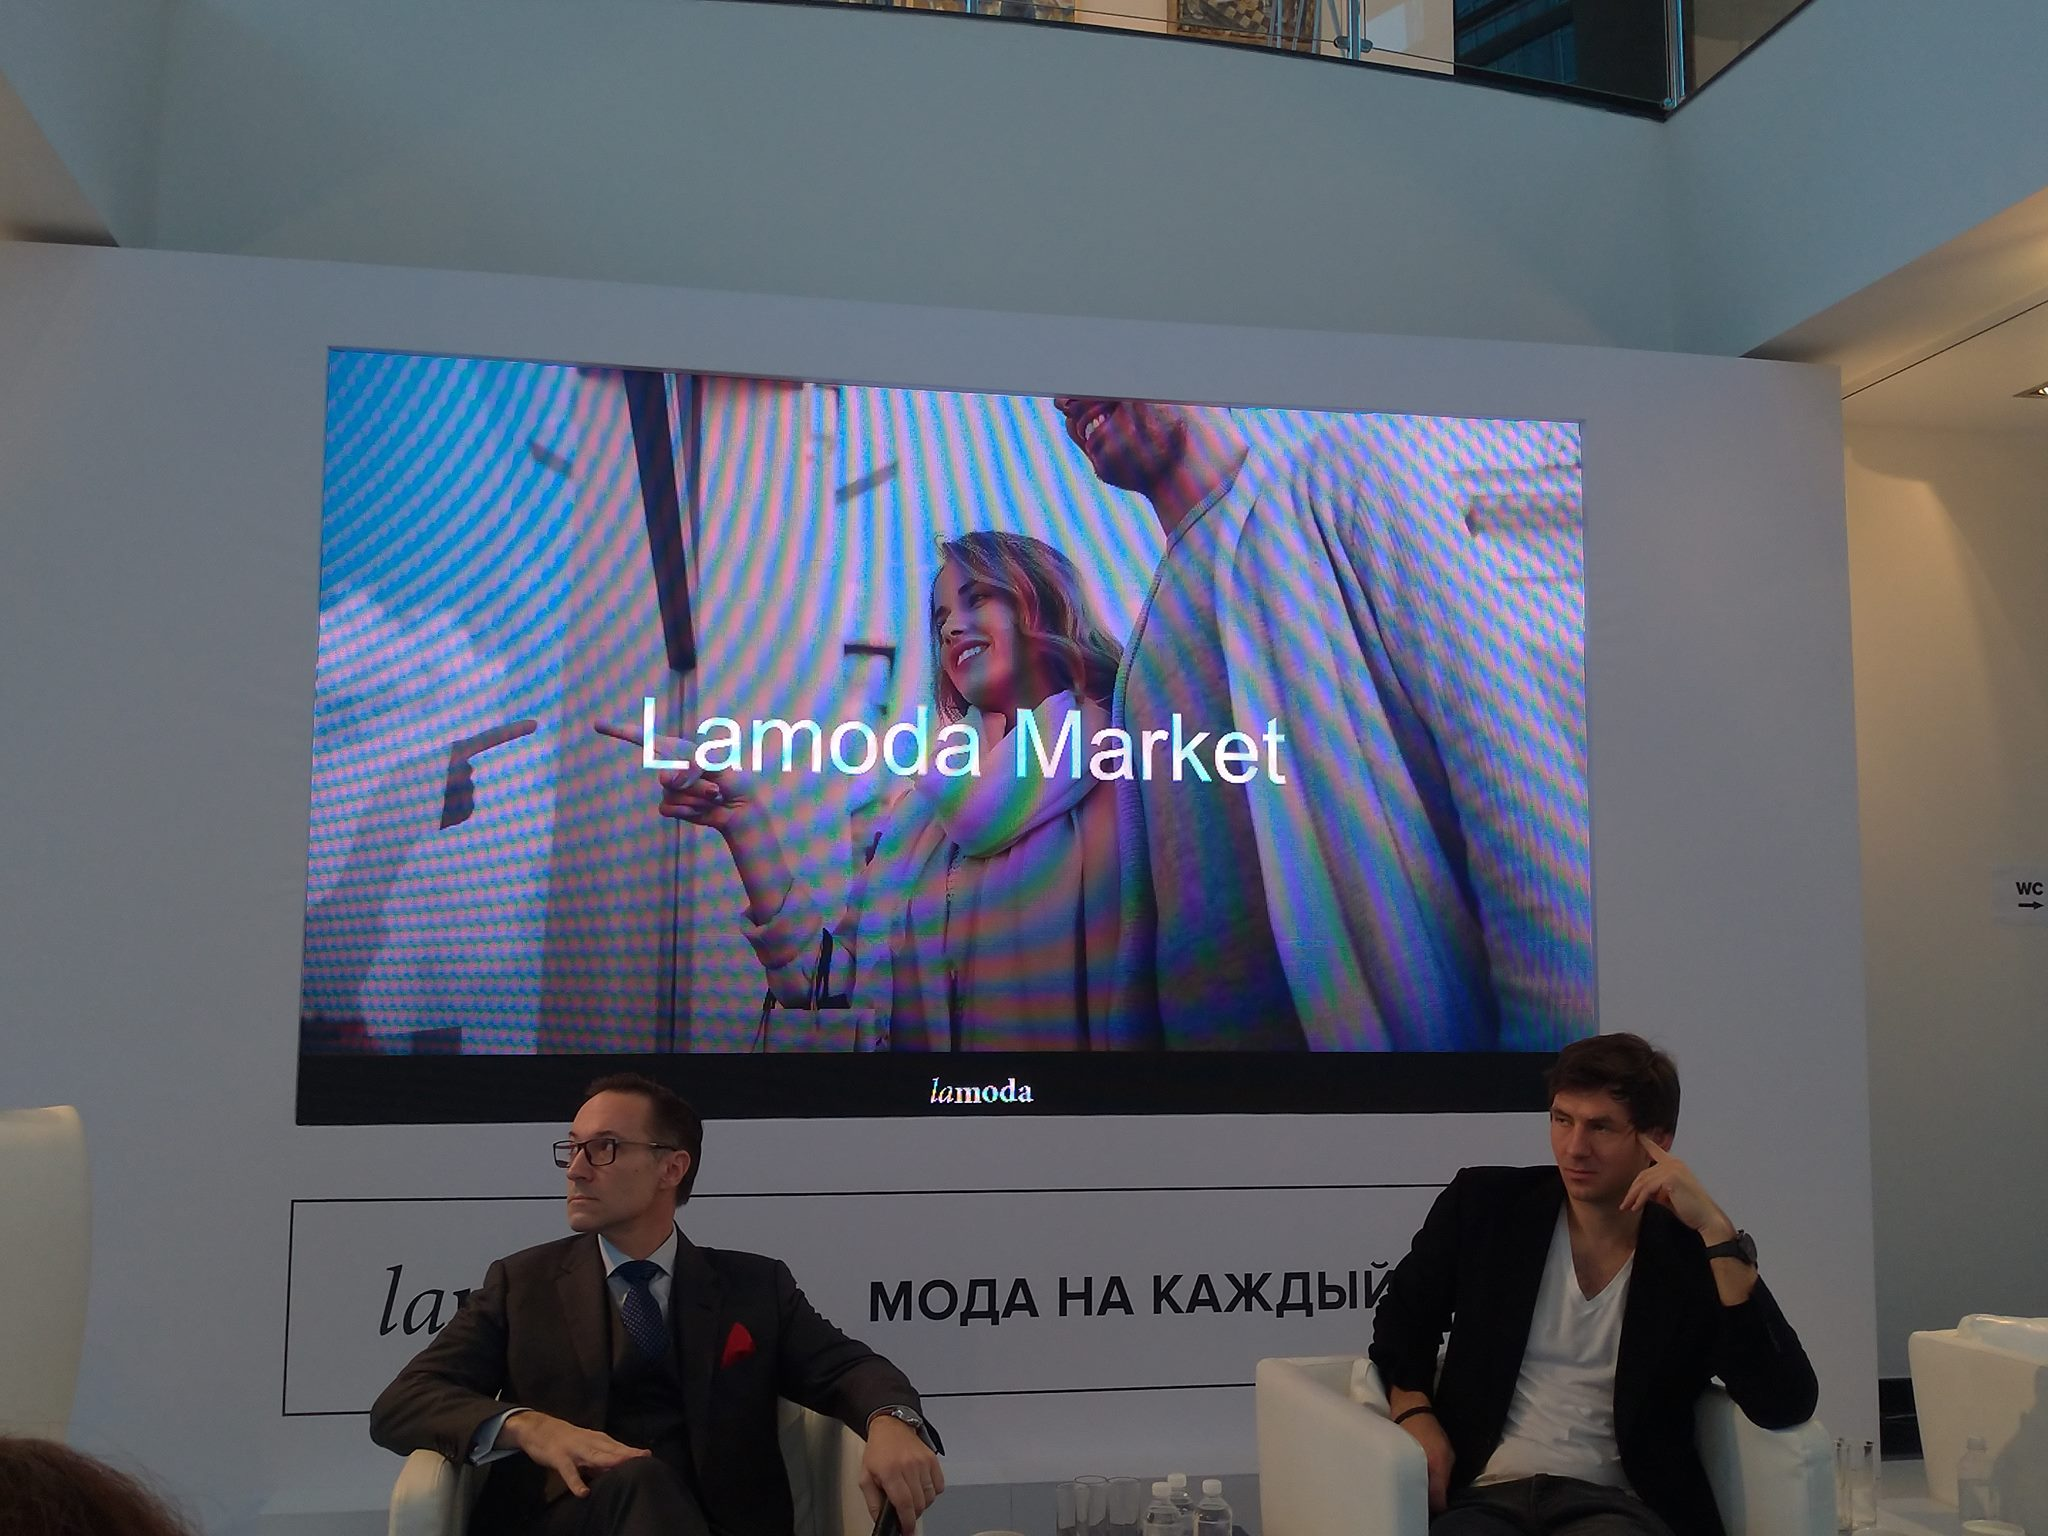 922d17e25e15 Lamoda запускает офлайн-магазин Lamoda Market - Retail Life!